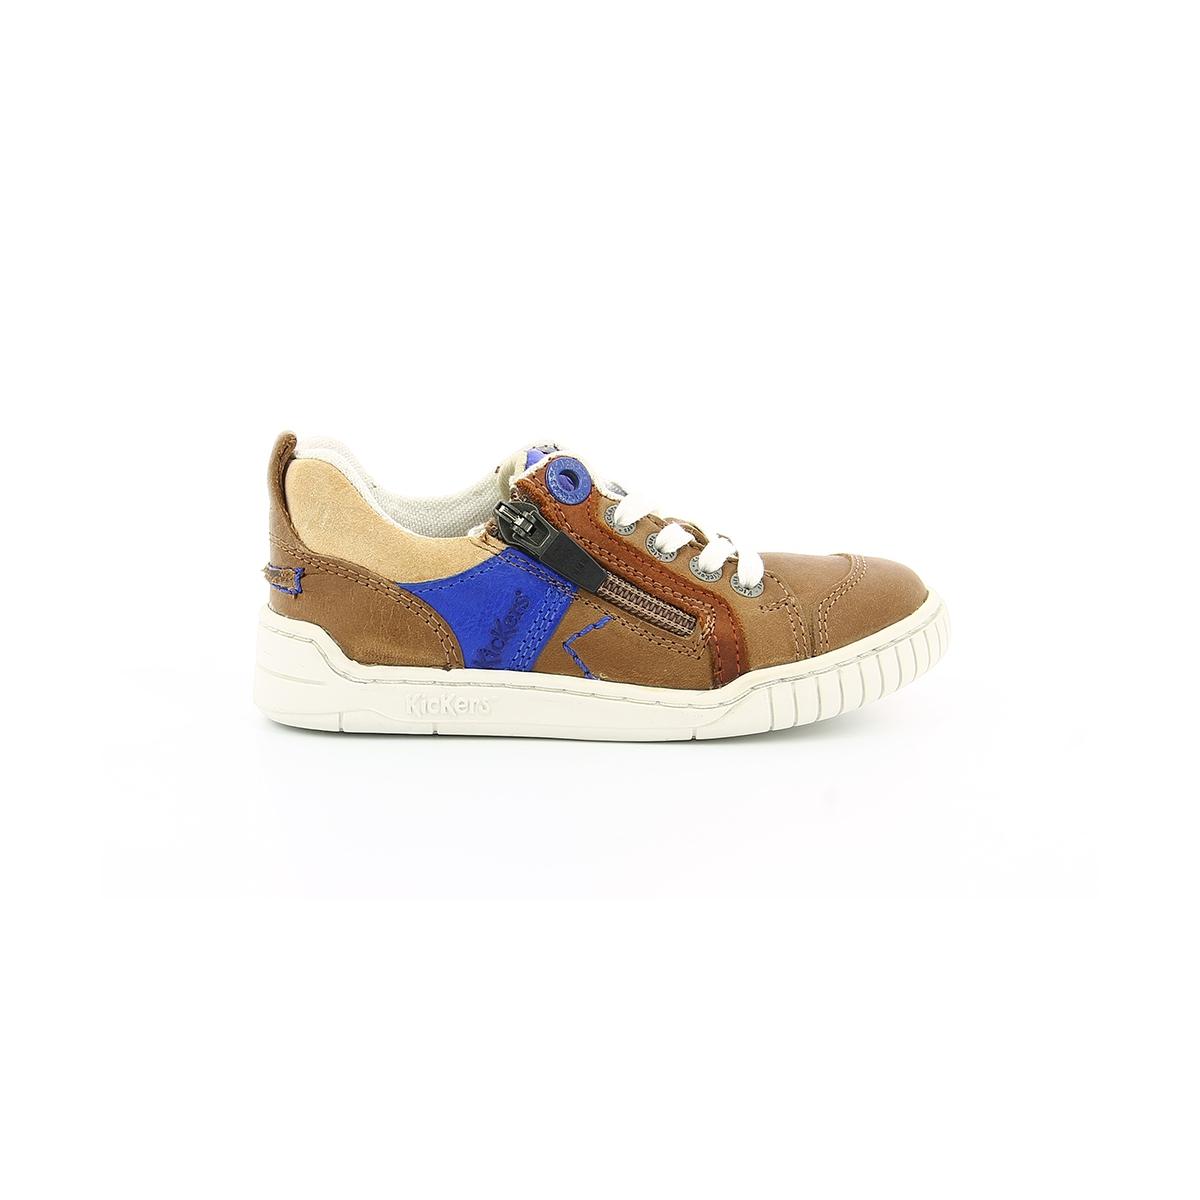 chaussures enfant winchester marron bleu kickers. Black Bedroom Furniture Sets. Home Design Ideas